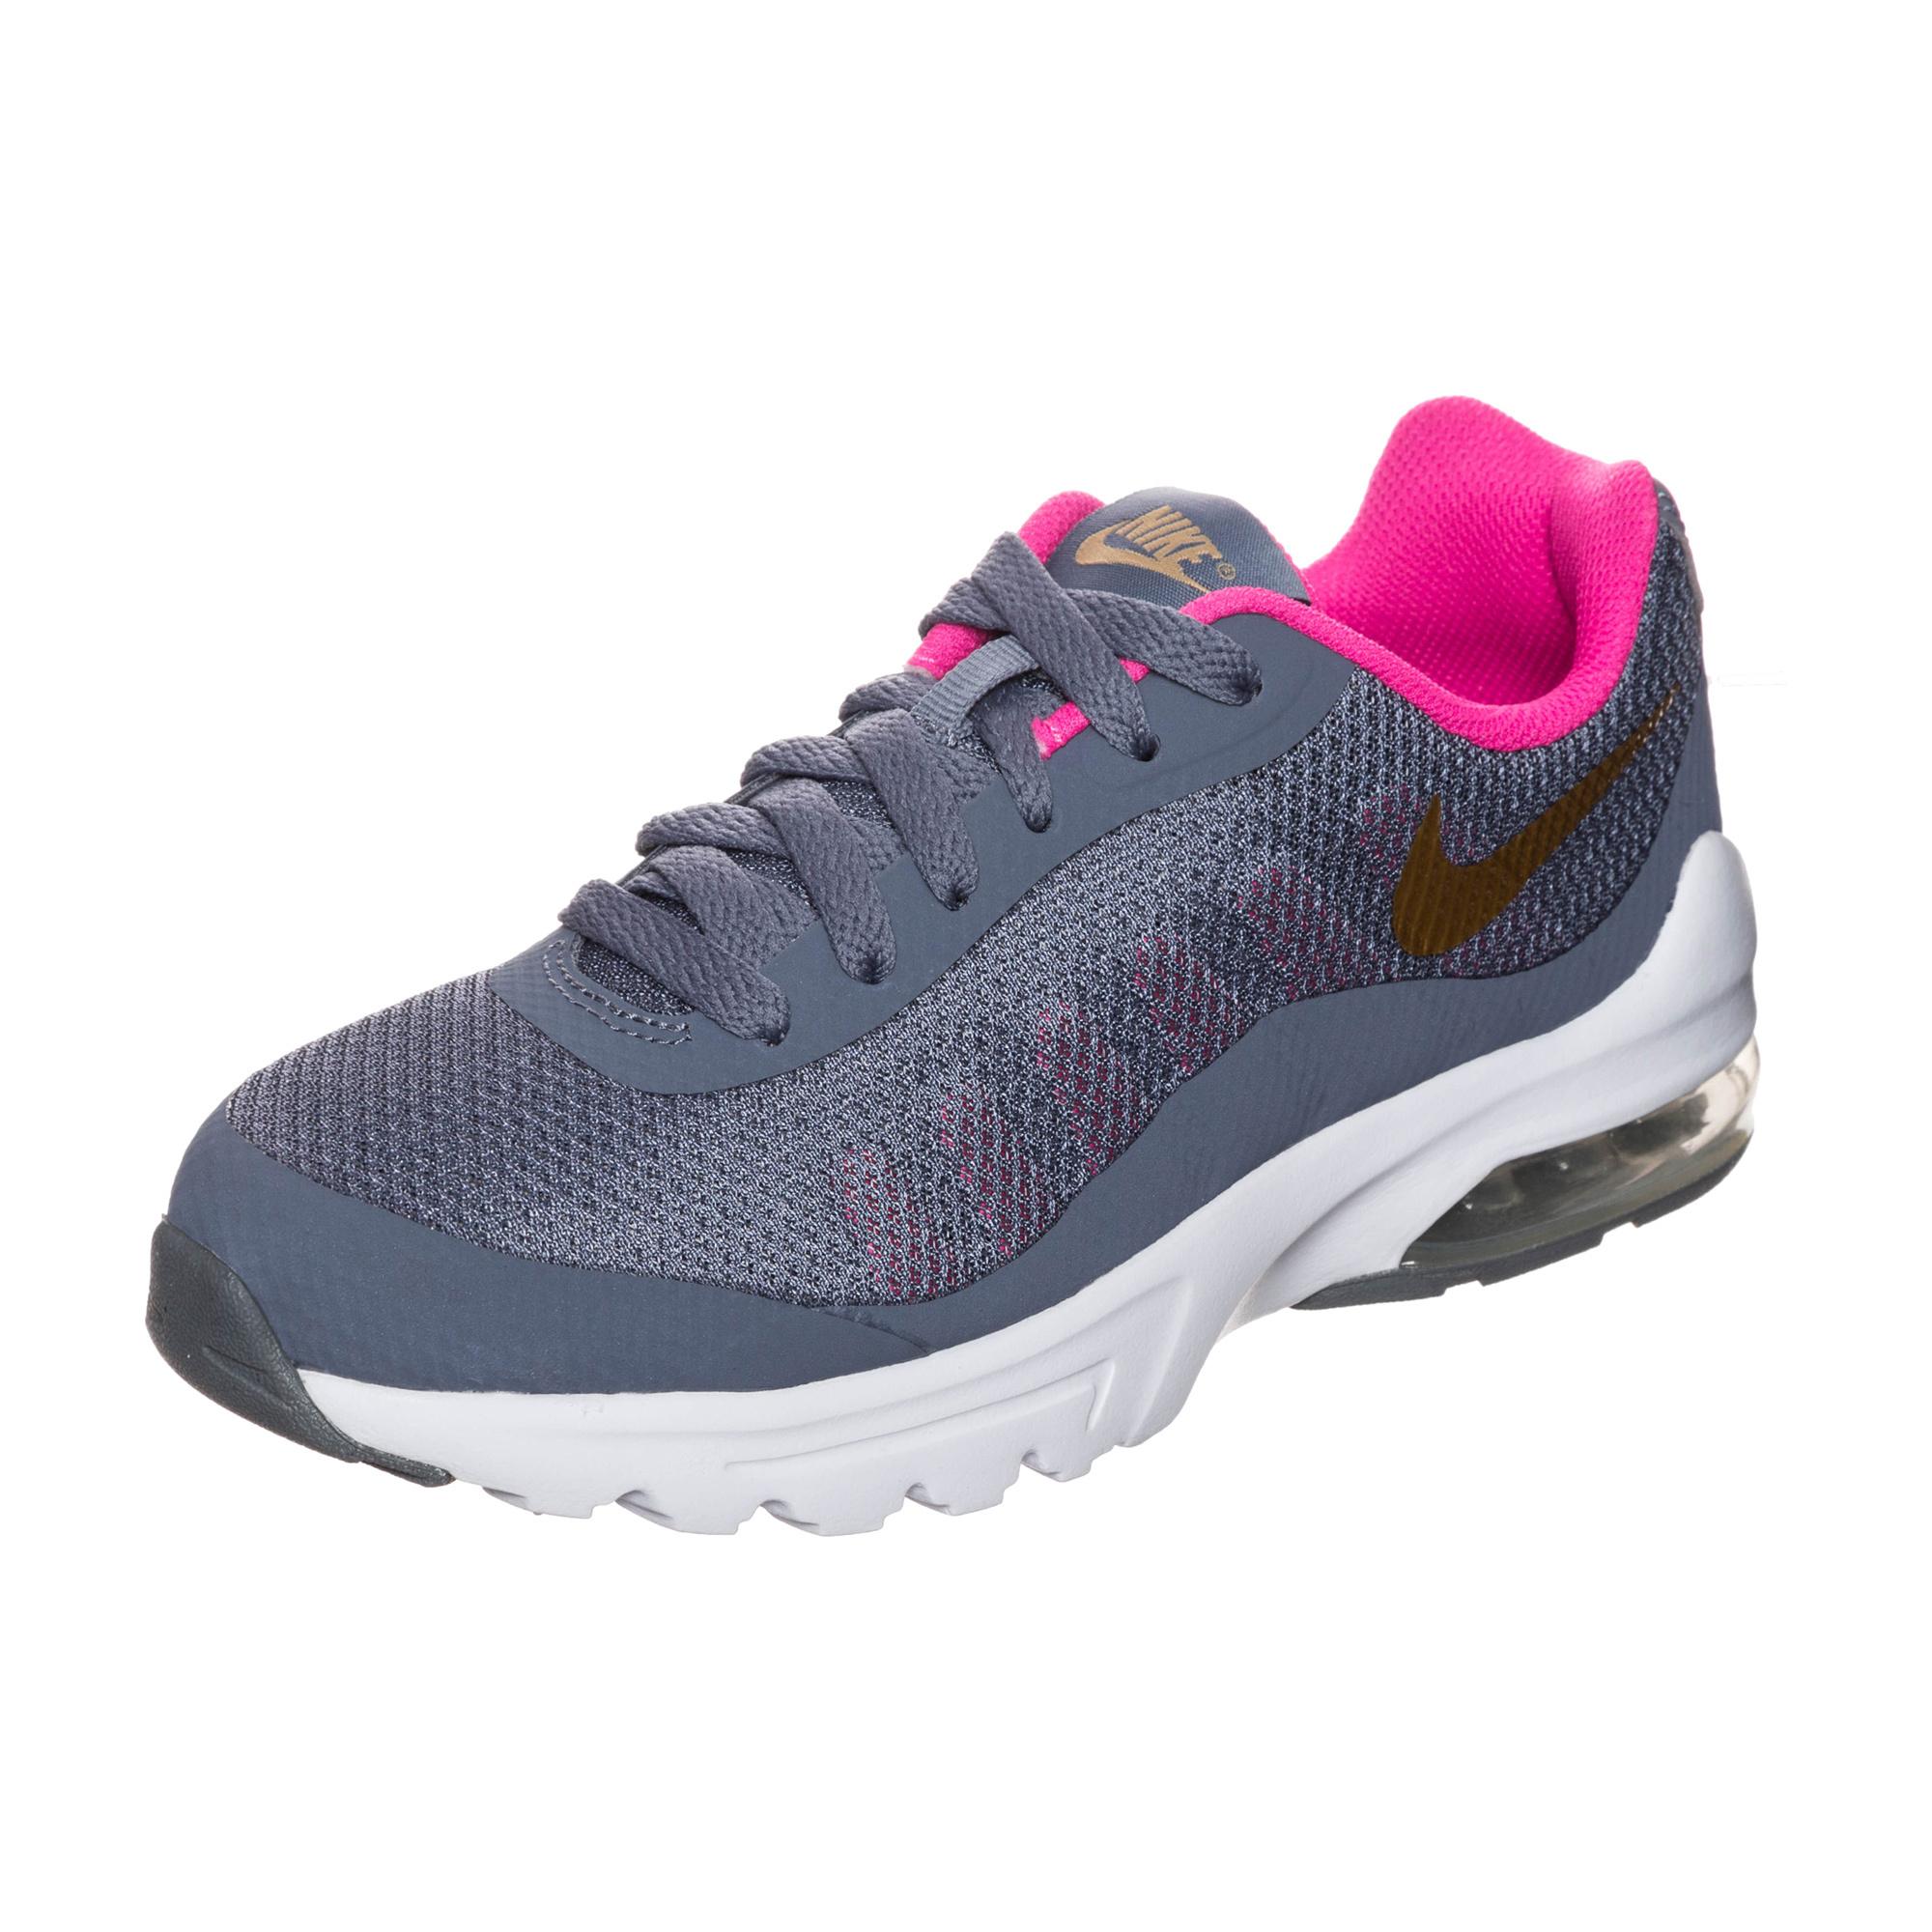 Nike AIR MAX INVIGOR GRADE SCHOOL girls's Shoes (Trainers